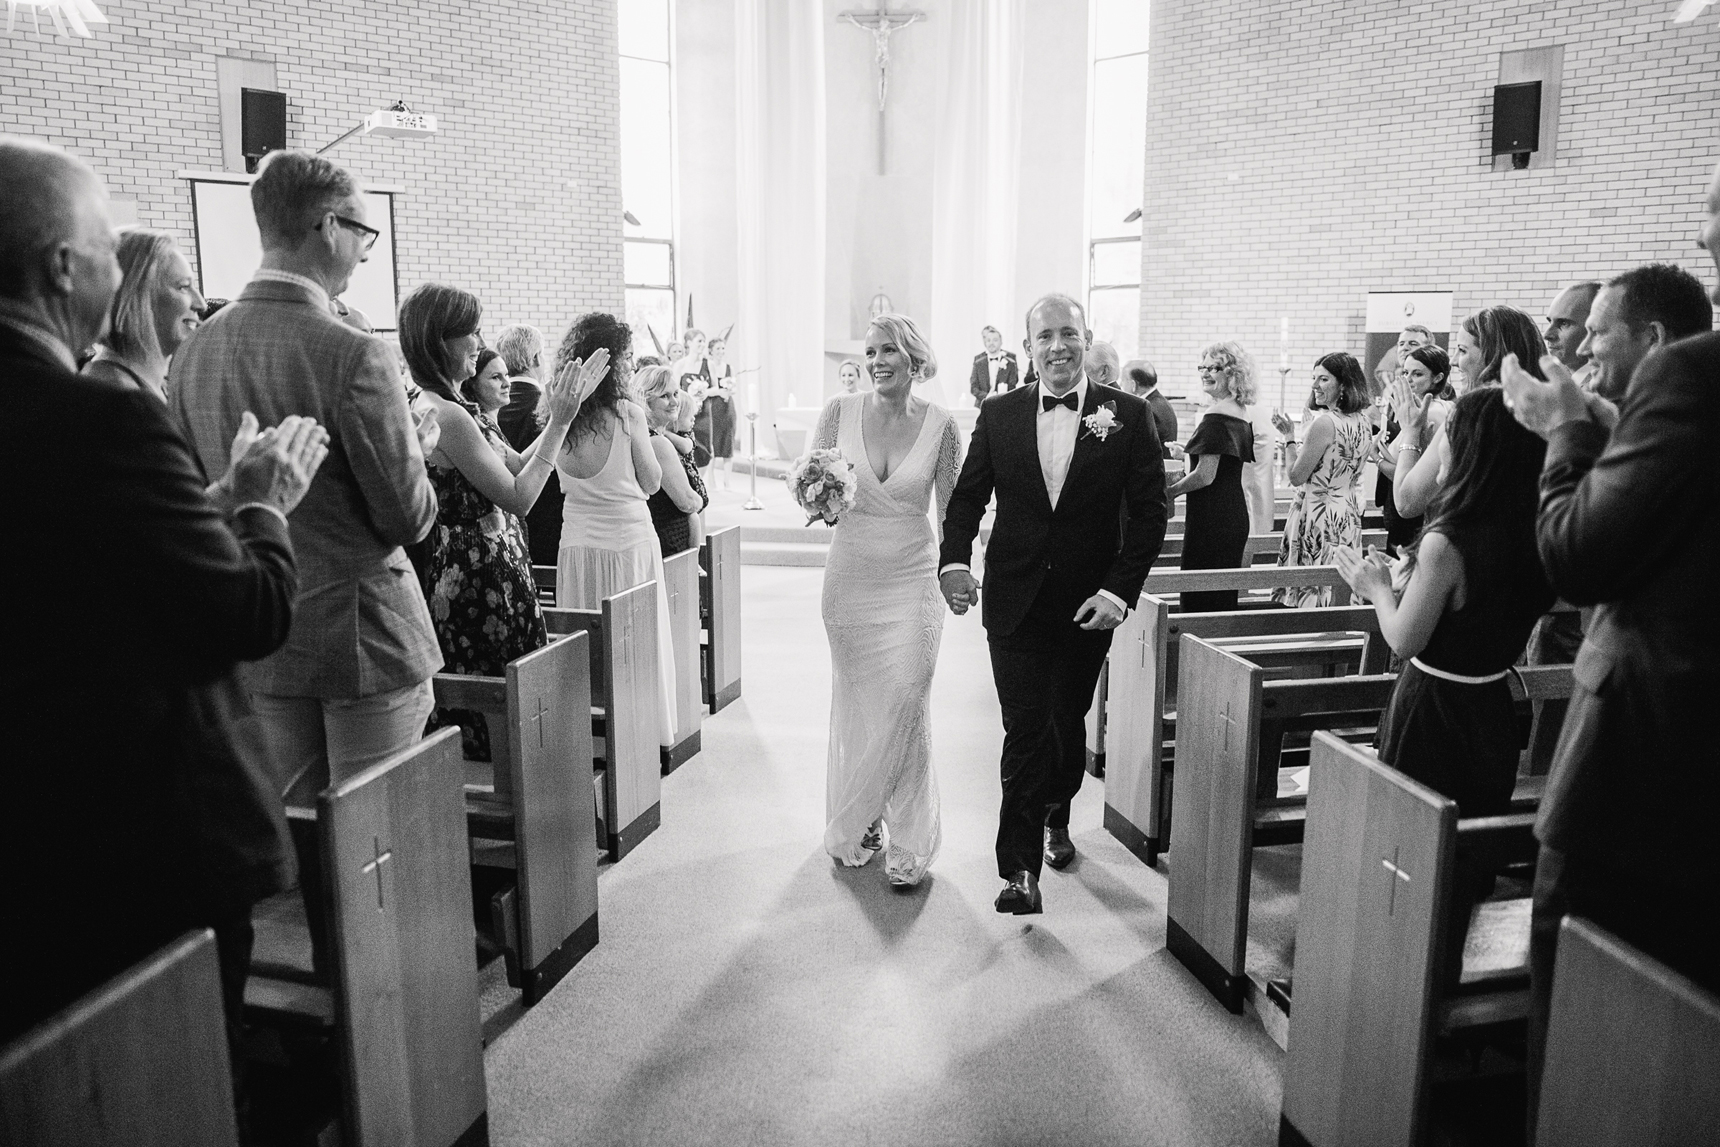 AngeRuss_MobyDicks_WhaleBeach_Wedding_Photography032.jpg